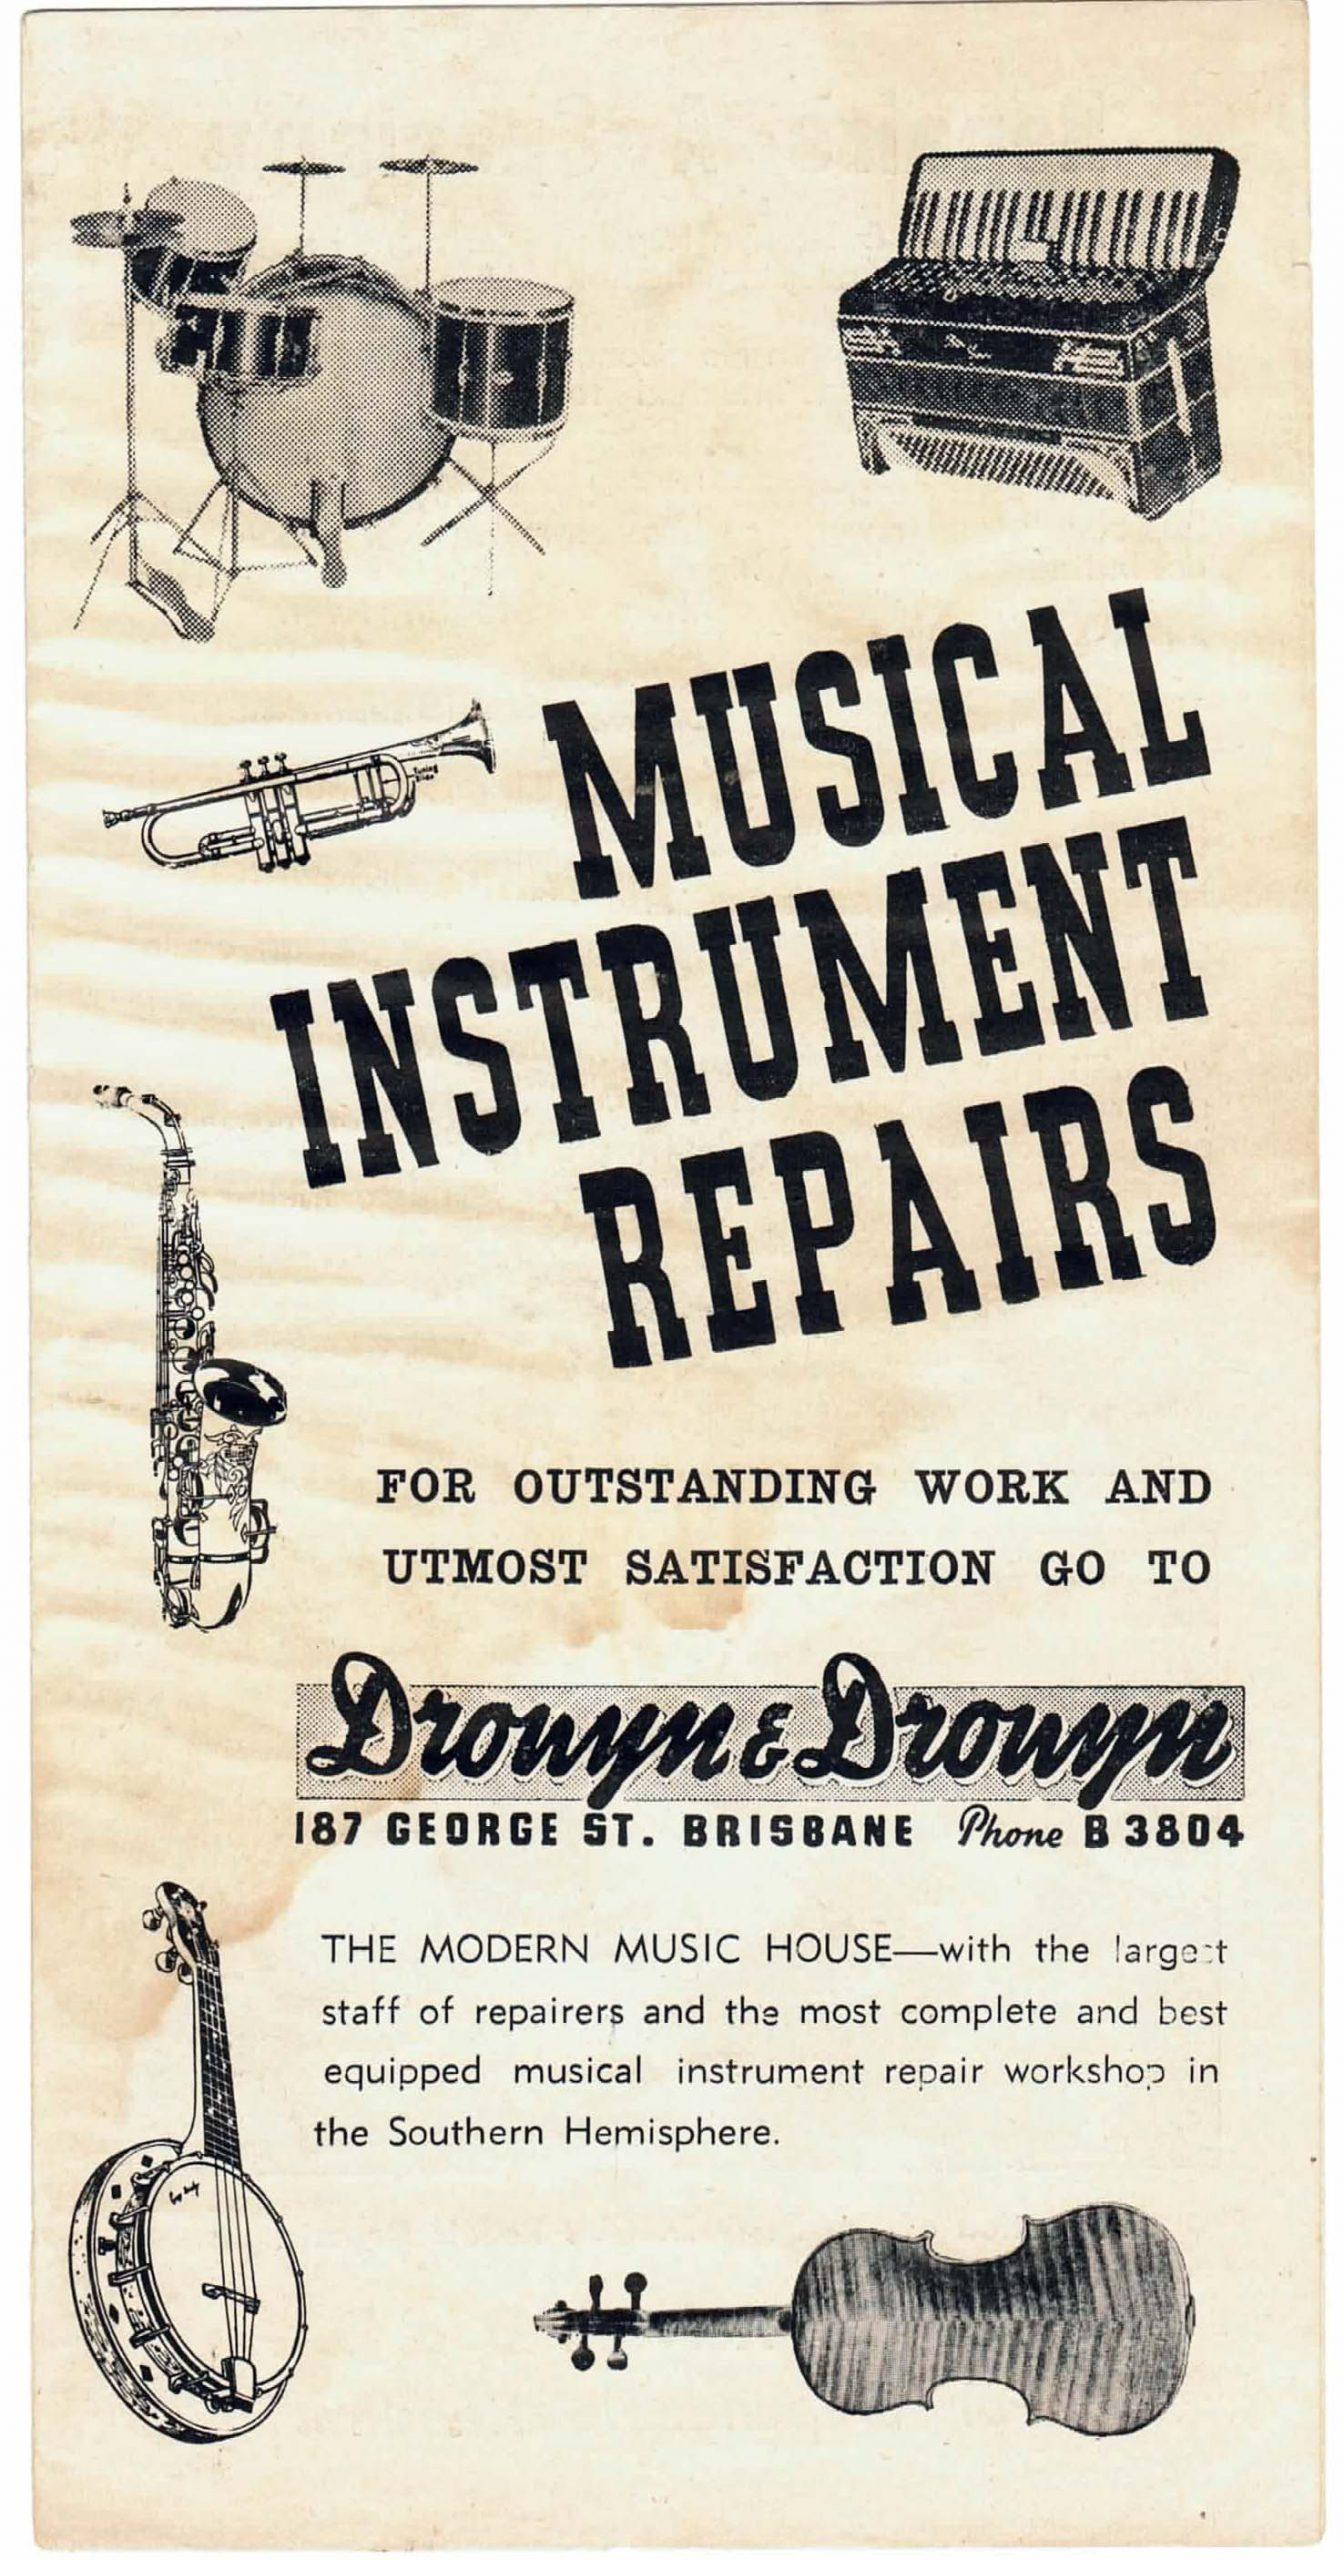 Drouyn & Drouyn musical instrument repair brochure